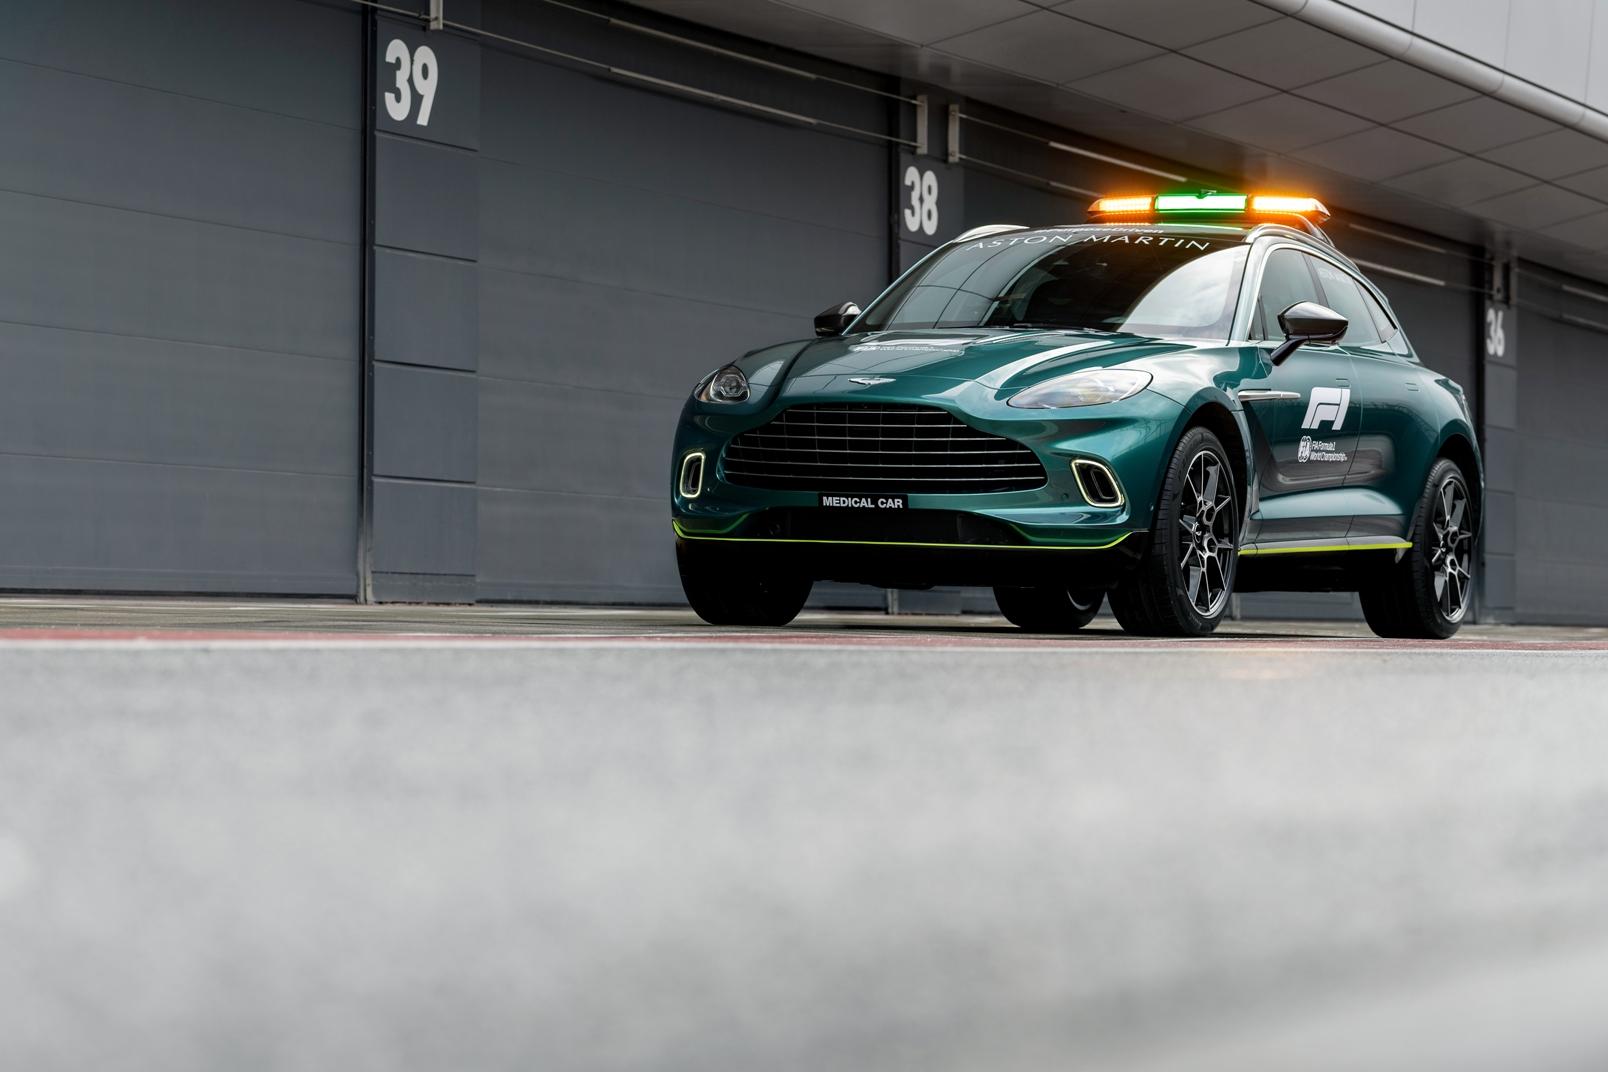 Aston Martin Dbx Official Medical Car Of Formula One (1)